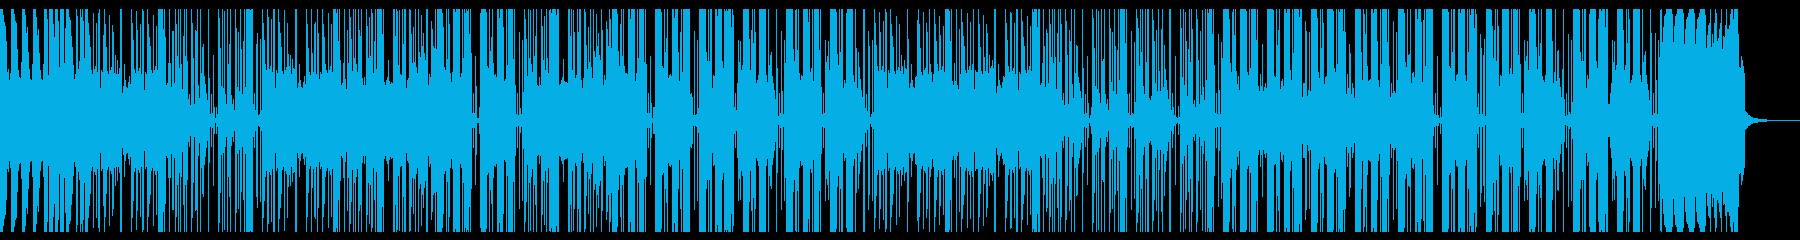 Lo-Fiビート_ファンキー_スイングの再生済みの波形